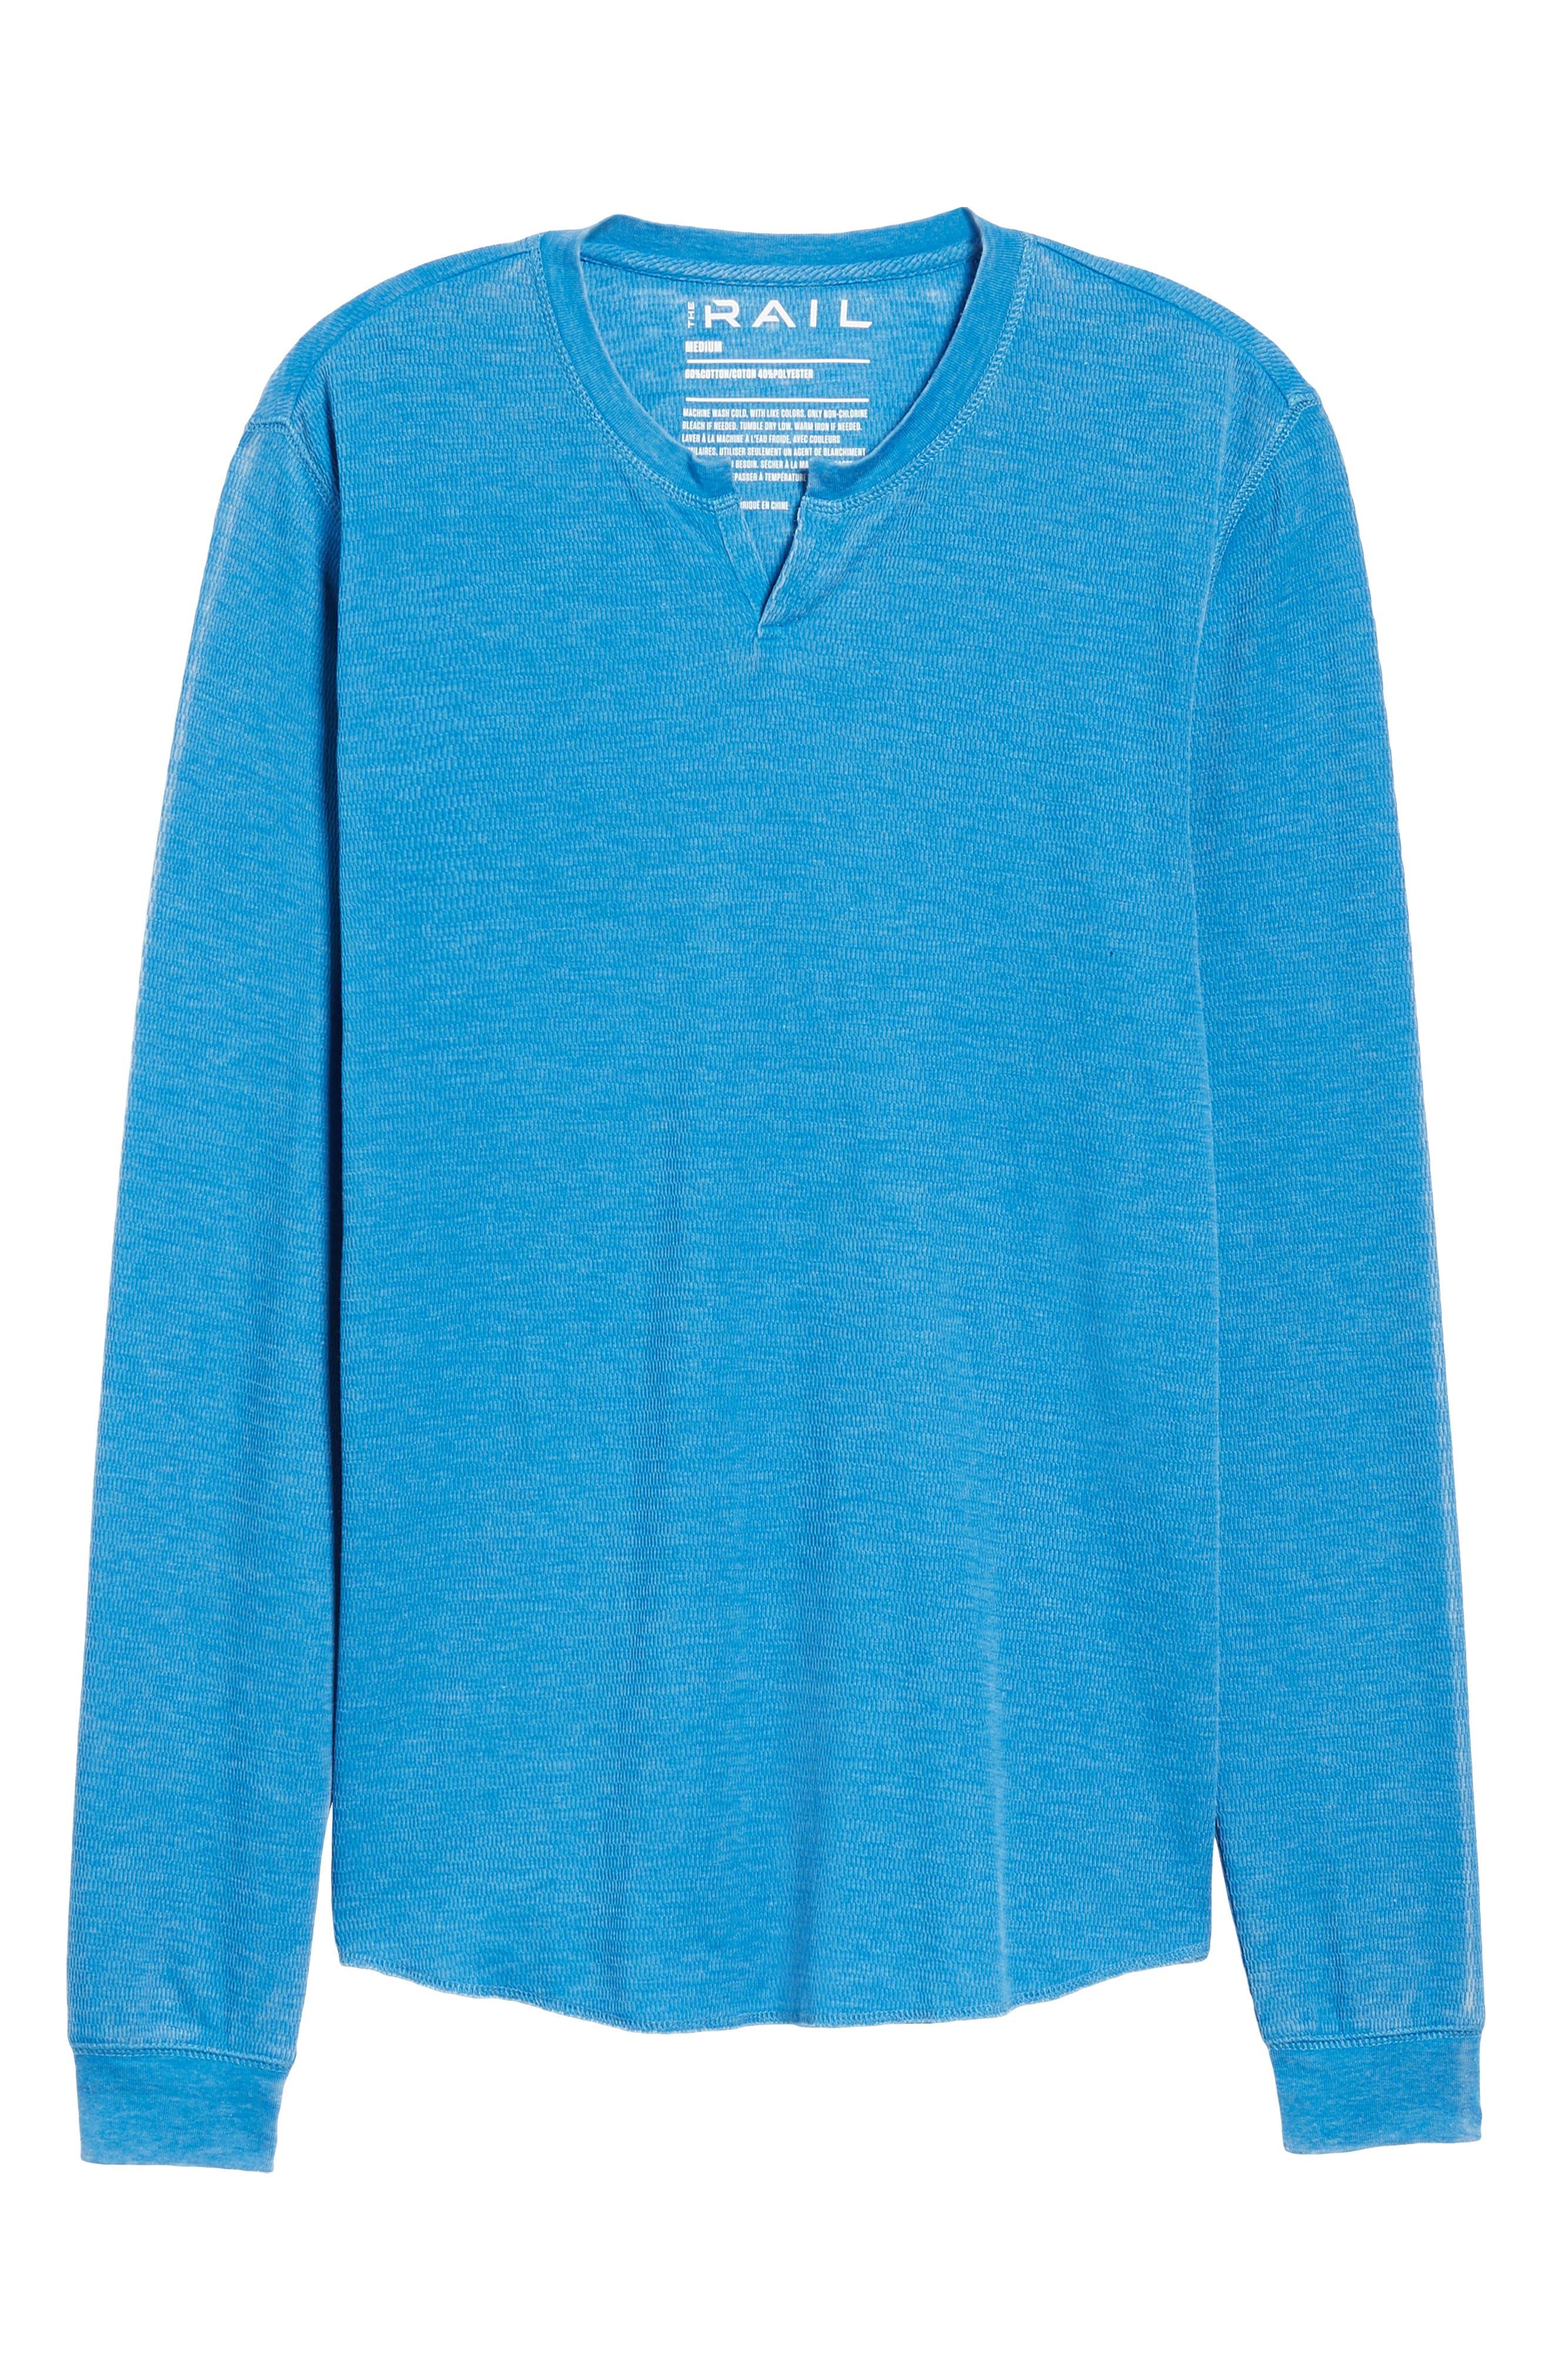 Notch Neck Thermal T-Shirt,                             Alternate thumbnail 40, color,